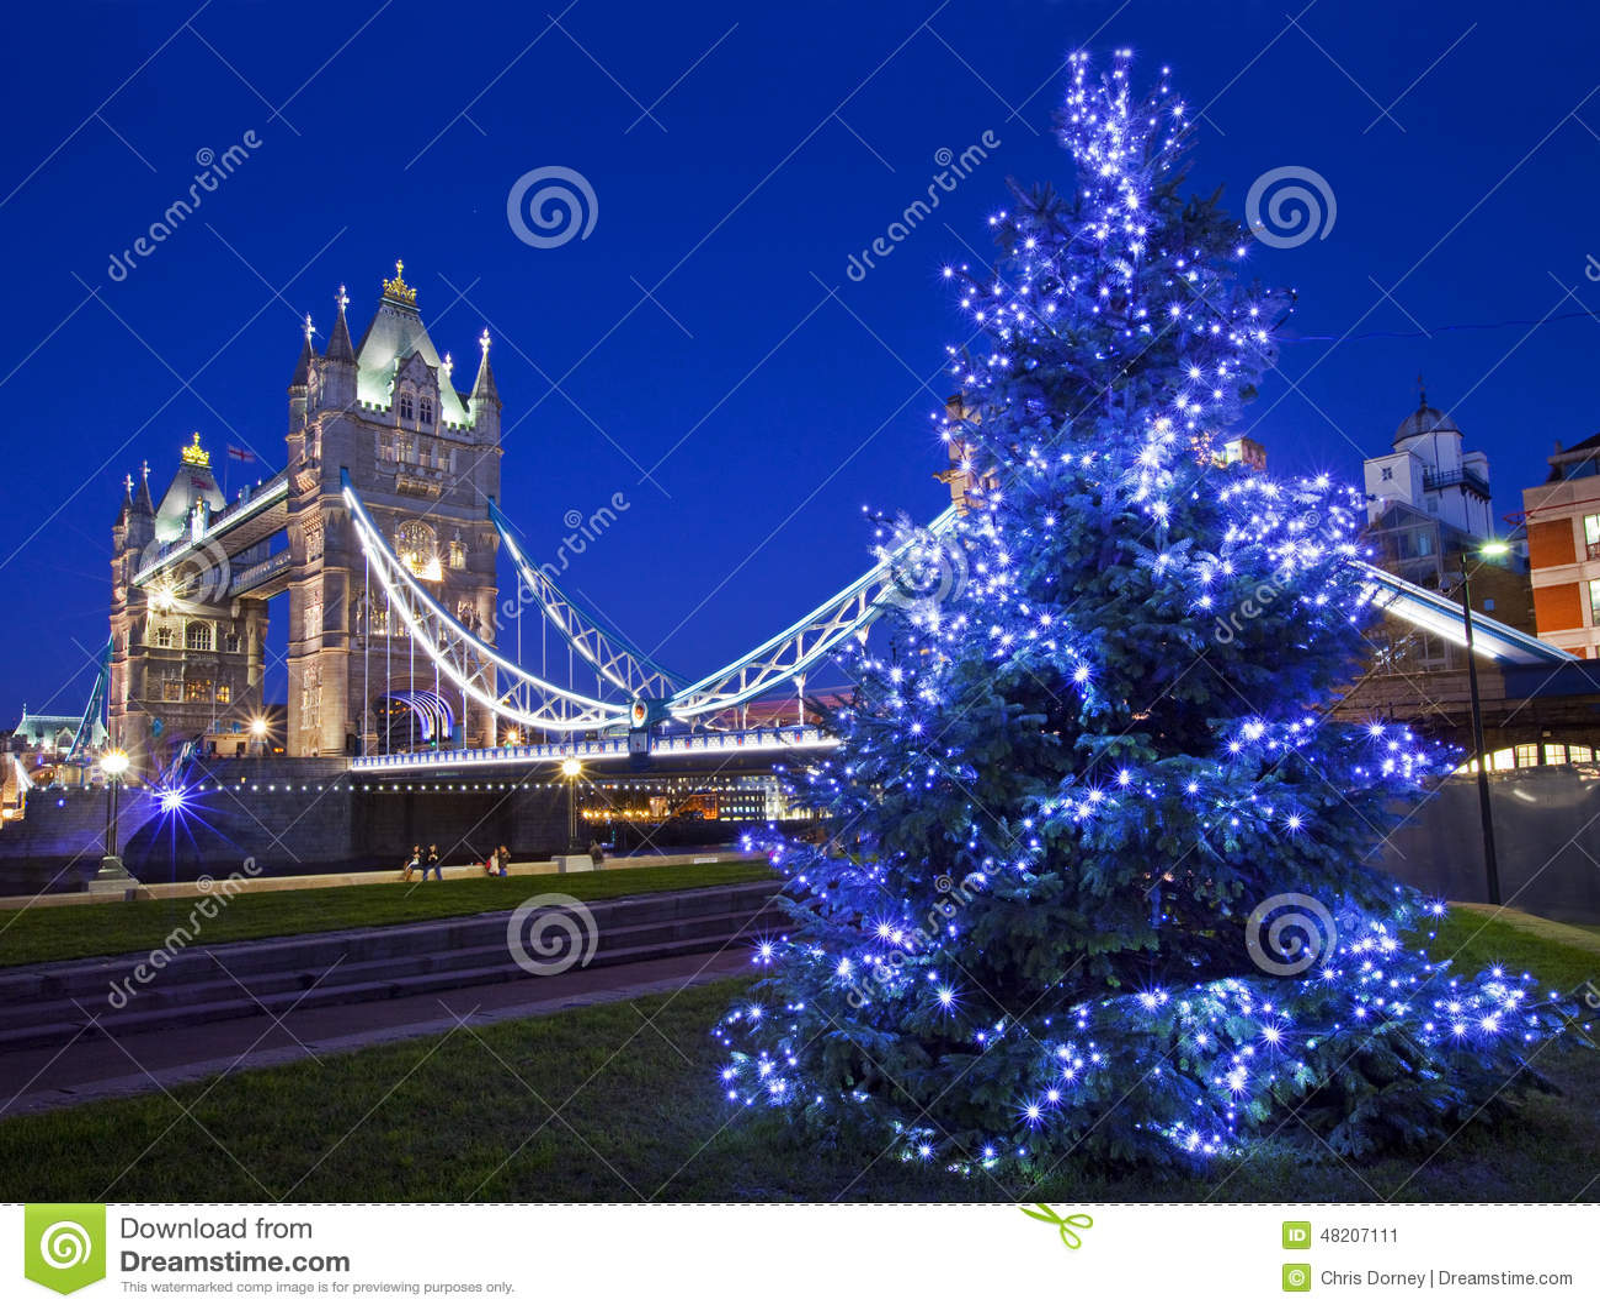 Tower Bridge And Christmas Tree In London Stock Photo ...